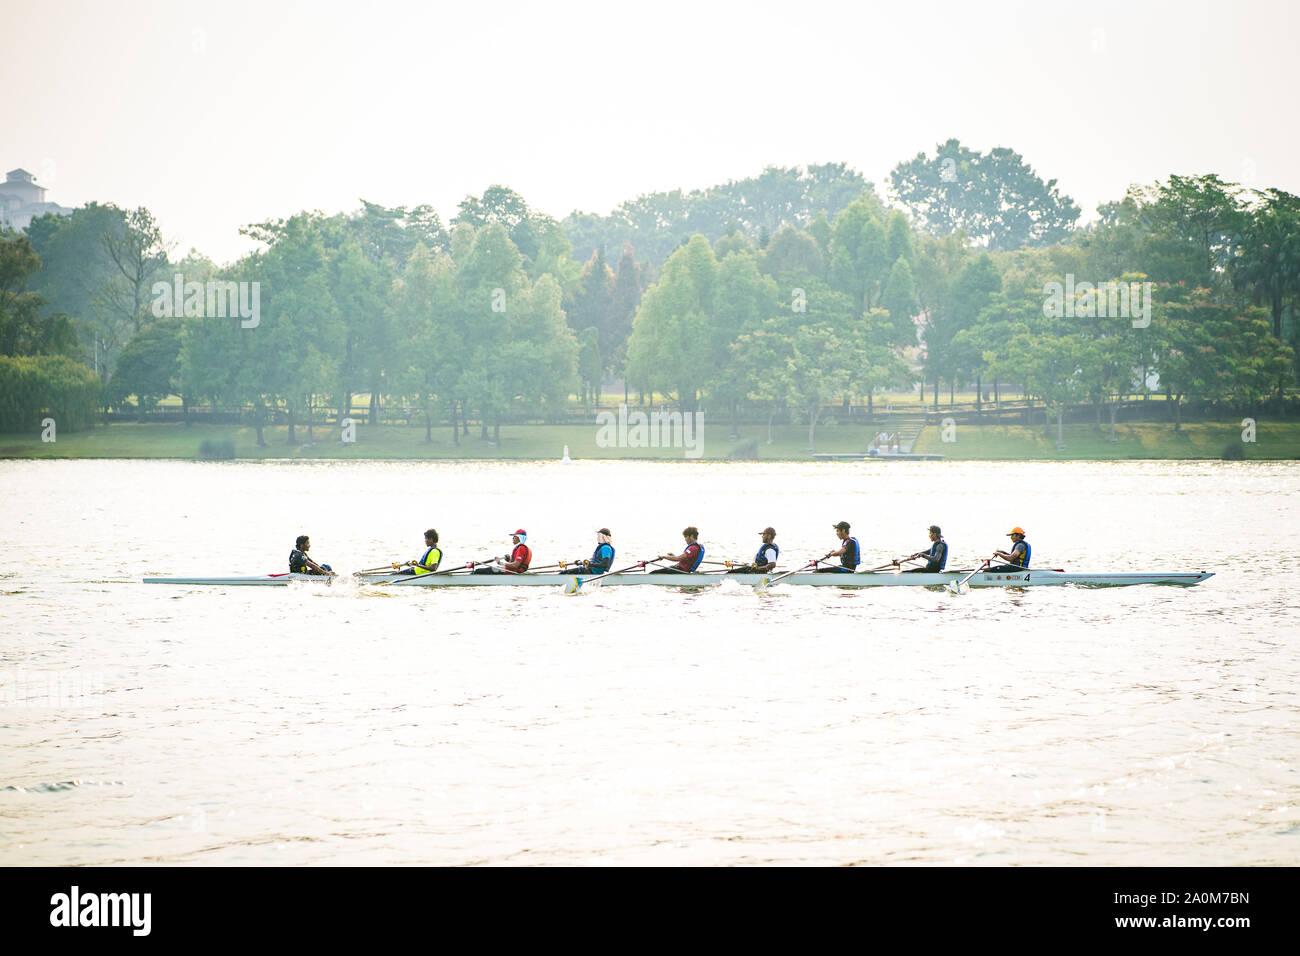 Putrajaya, Malaysia - September 6, 2019: Dragon boat racer practice at the lake near Taman Botani. Stock Photo